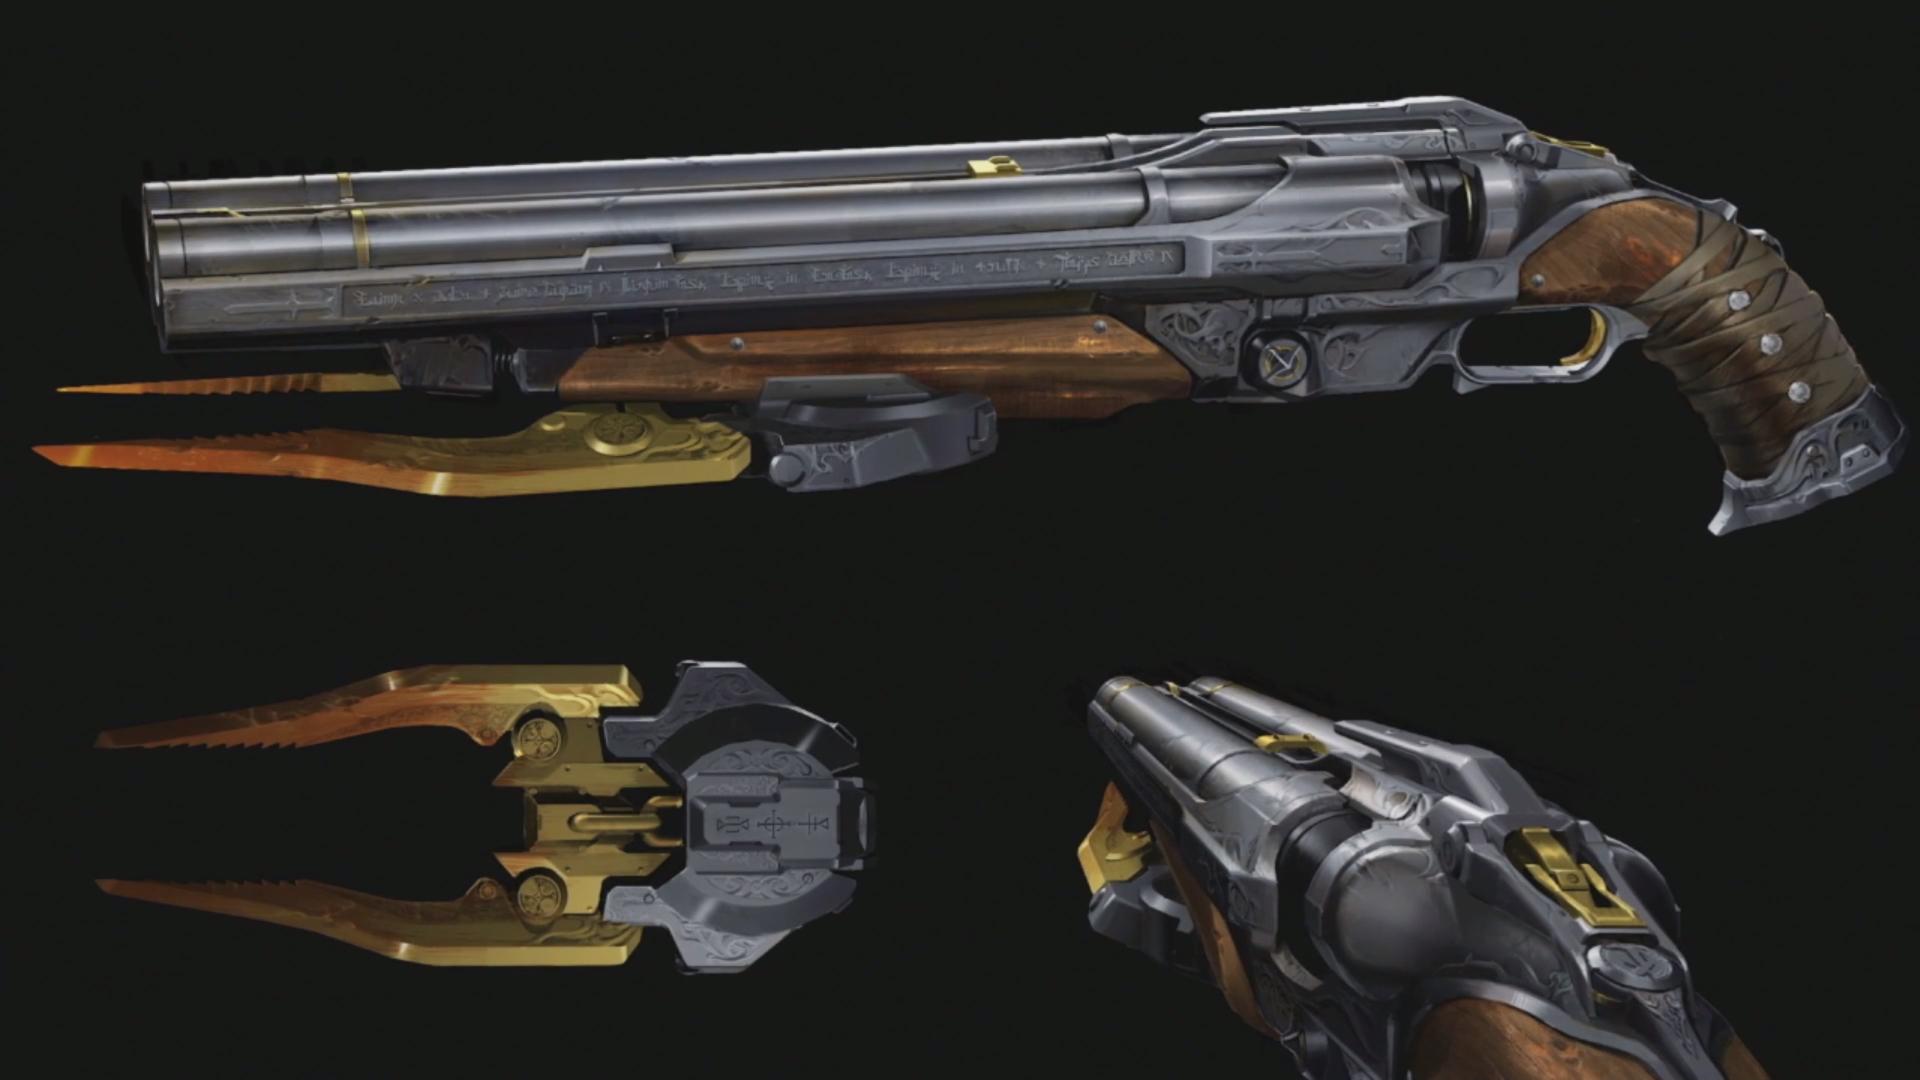 https://www.pcgamesn.com/wp-content/uploads/2018/08/Doom-Eternal-Super-Shotgun.jpg